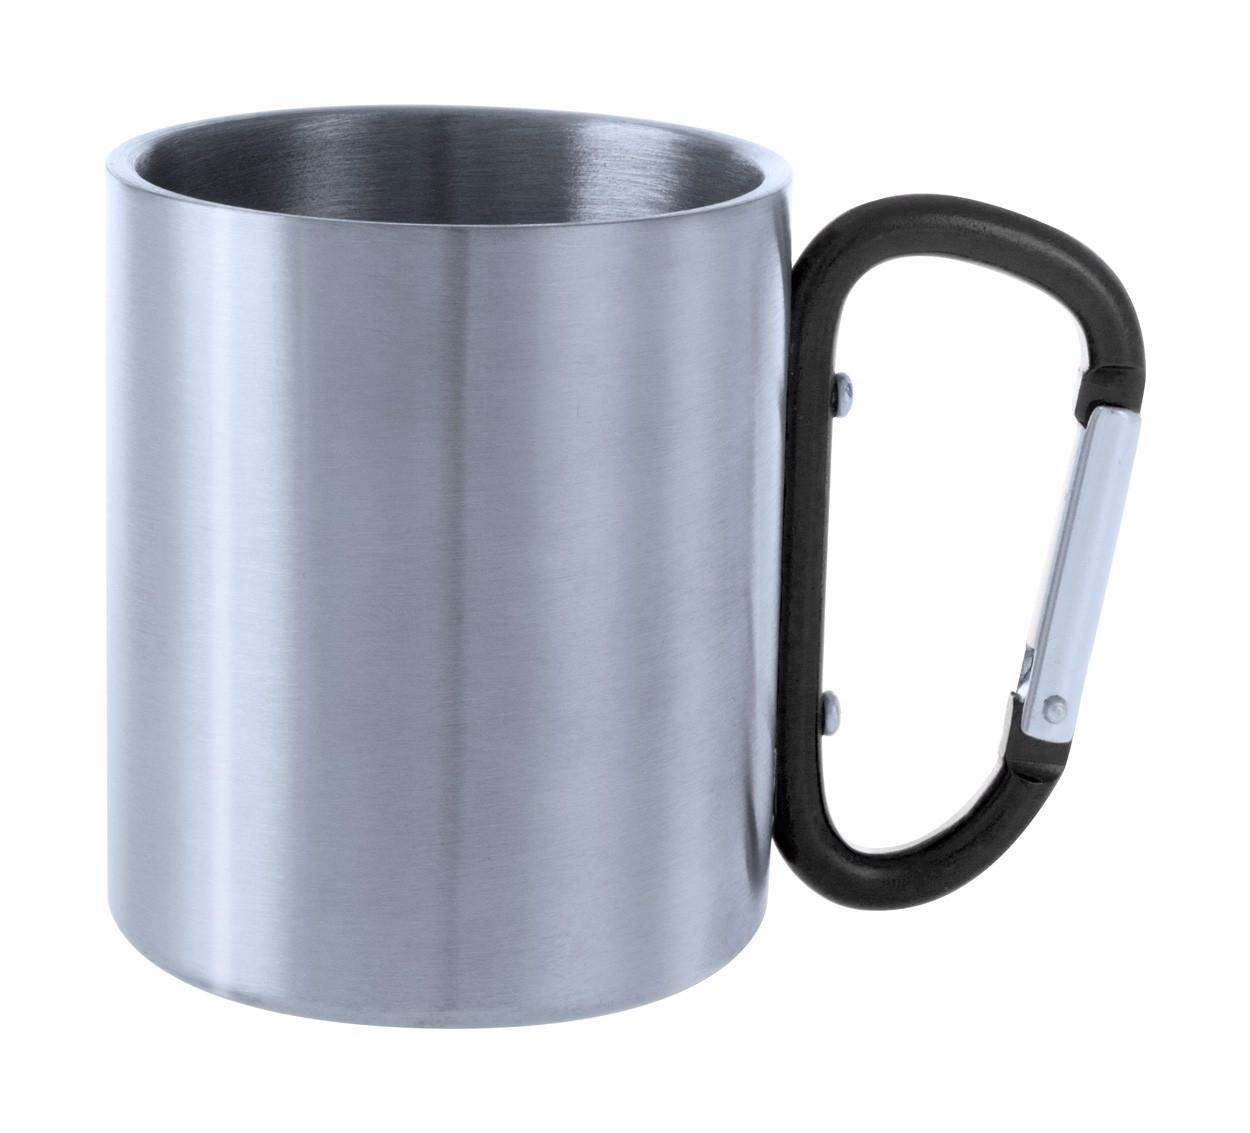 Metal Mug Bastic - Black / Silver